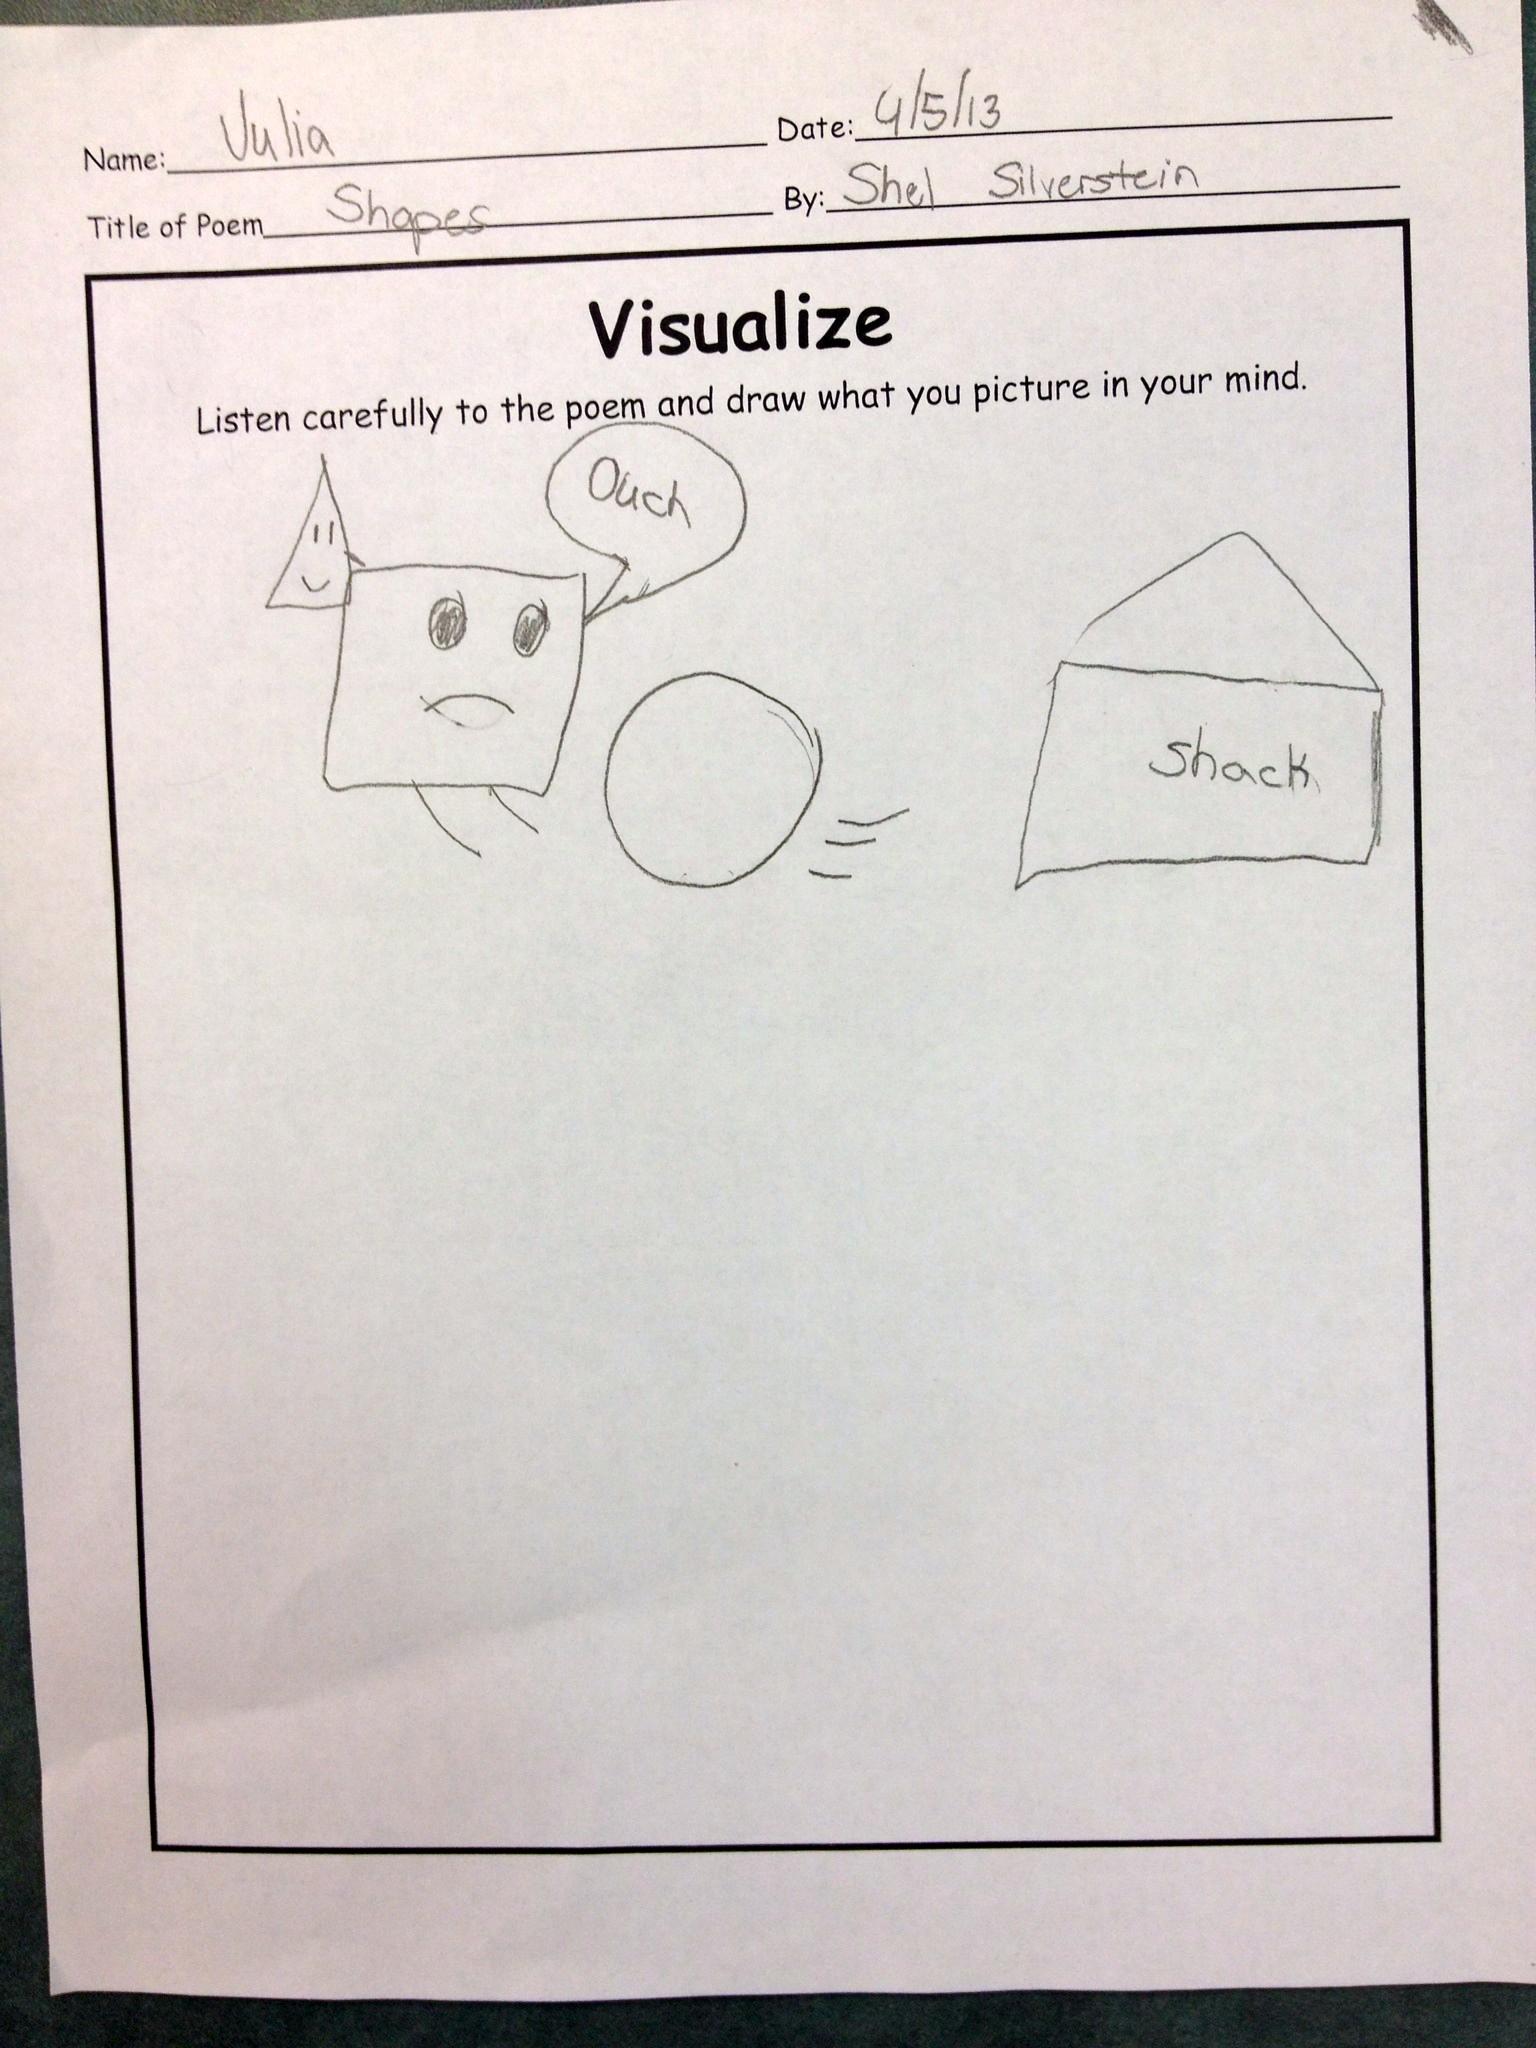 Visualizing Shel Silverstein